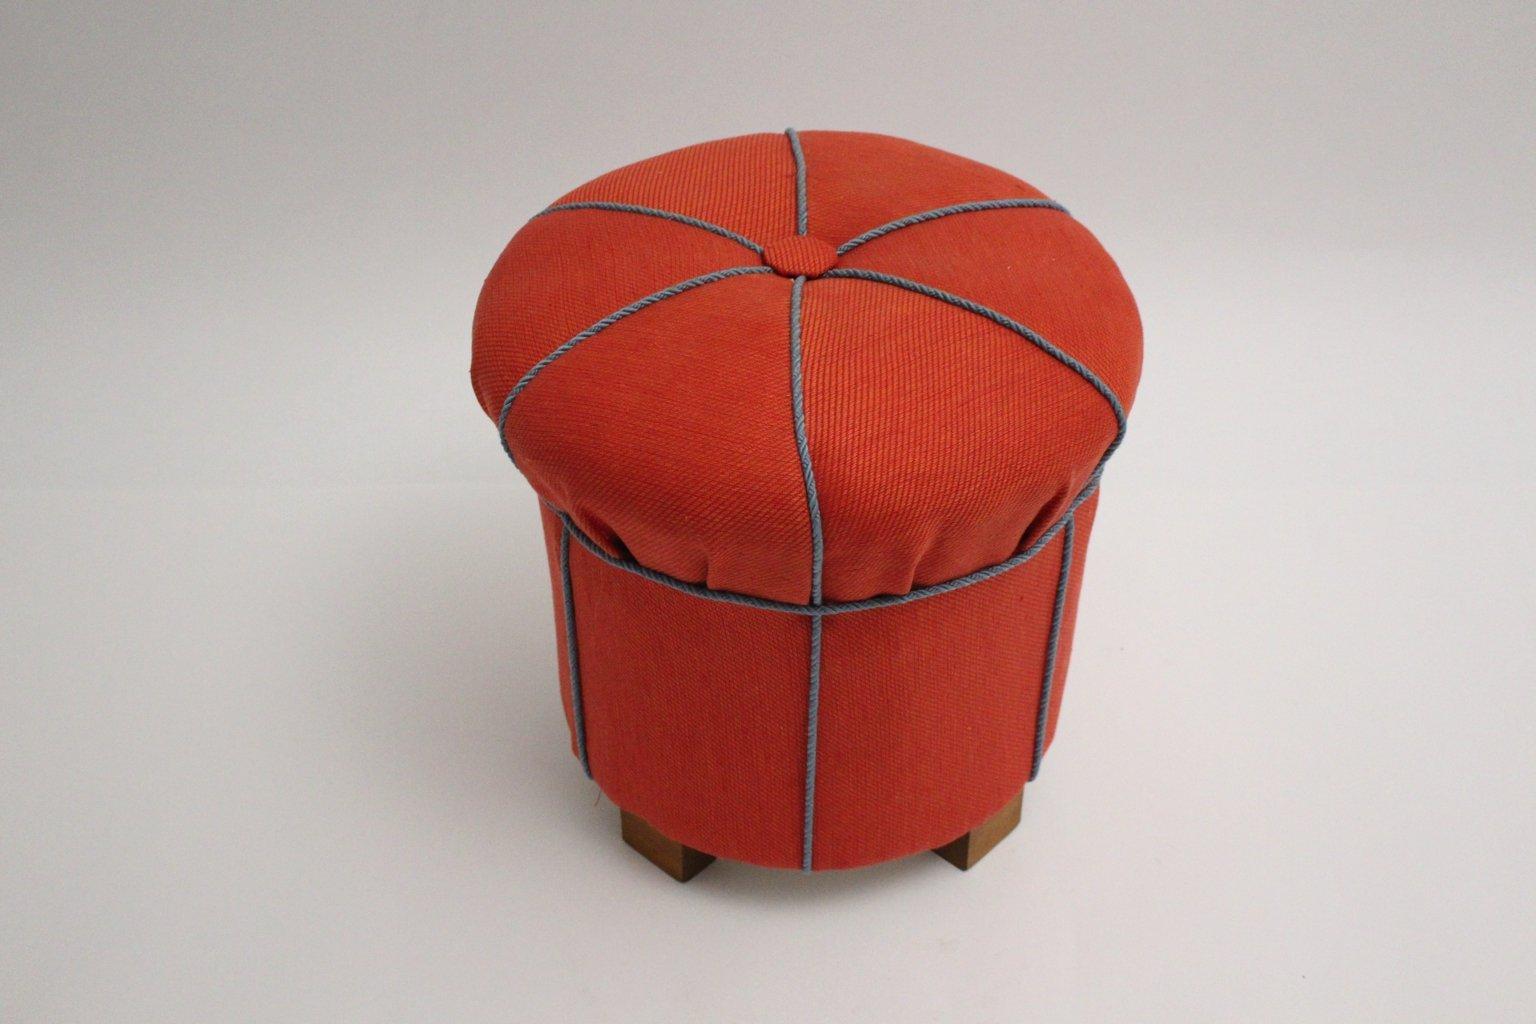 art deco pouf 1930er bei pamono kaufen. Black Bedroom Furniture Sets. Home Design Ideas